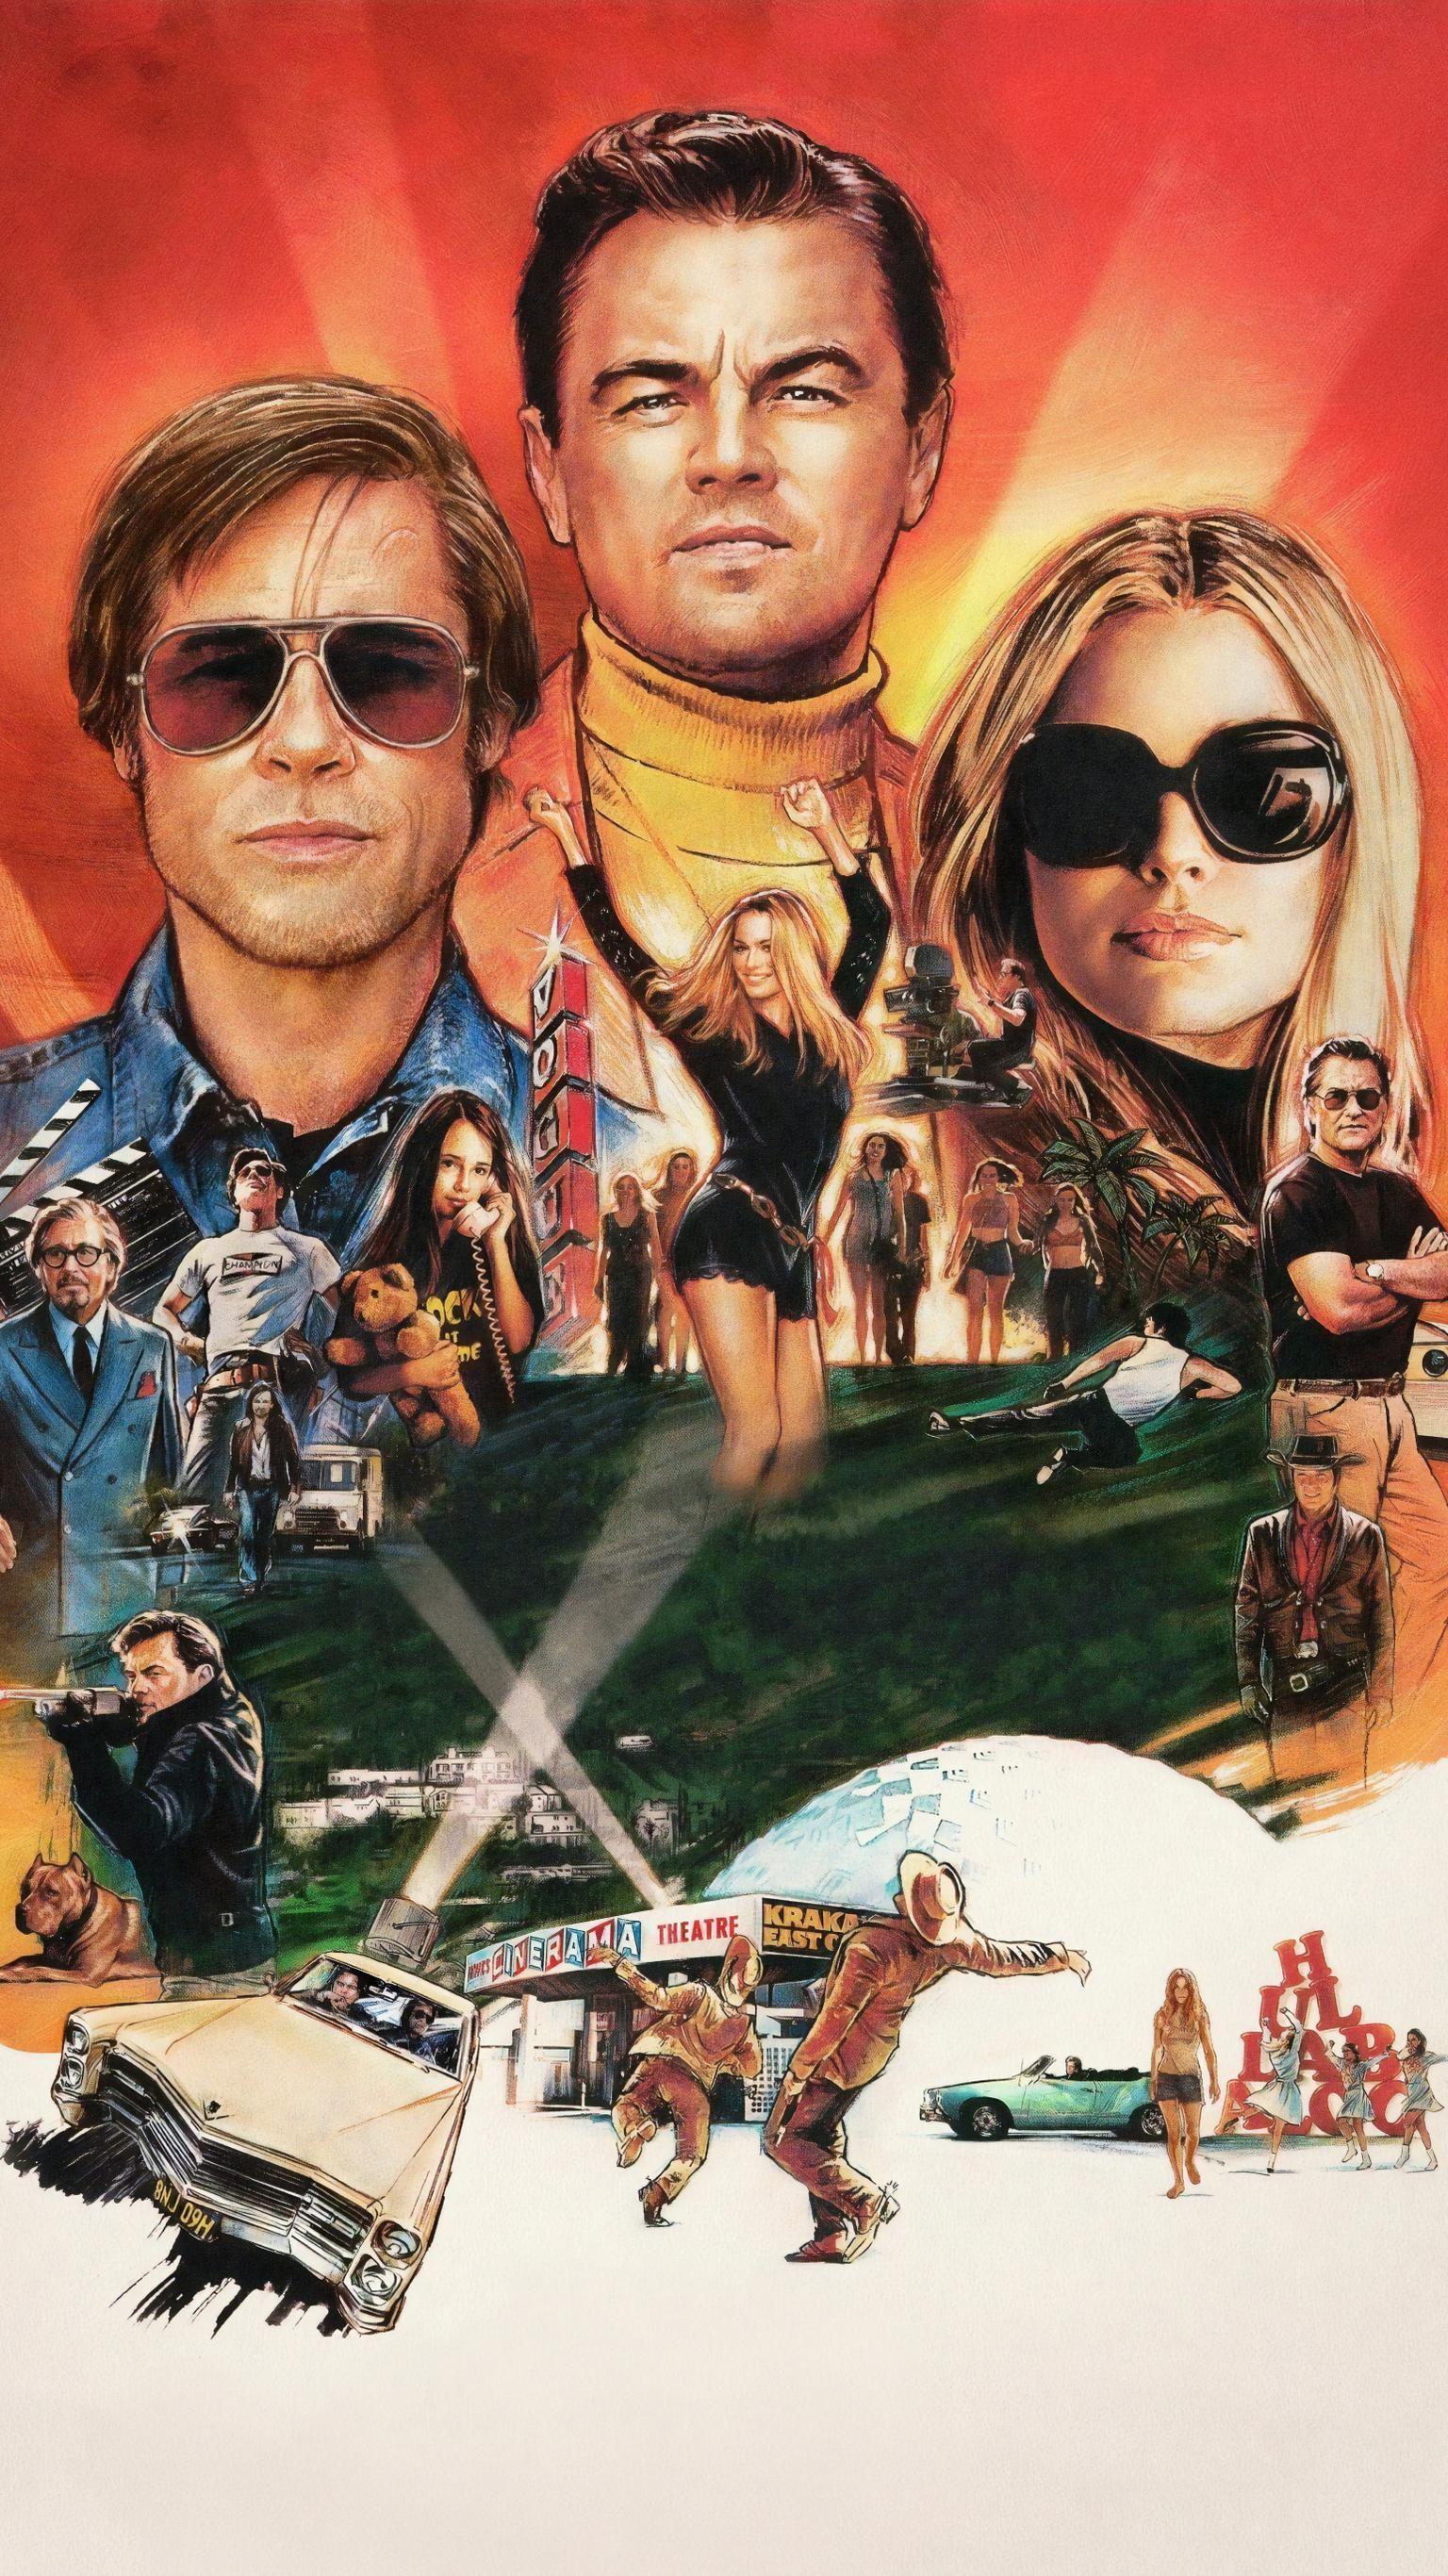 Quentin Tarantino фильмы